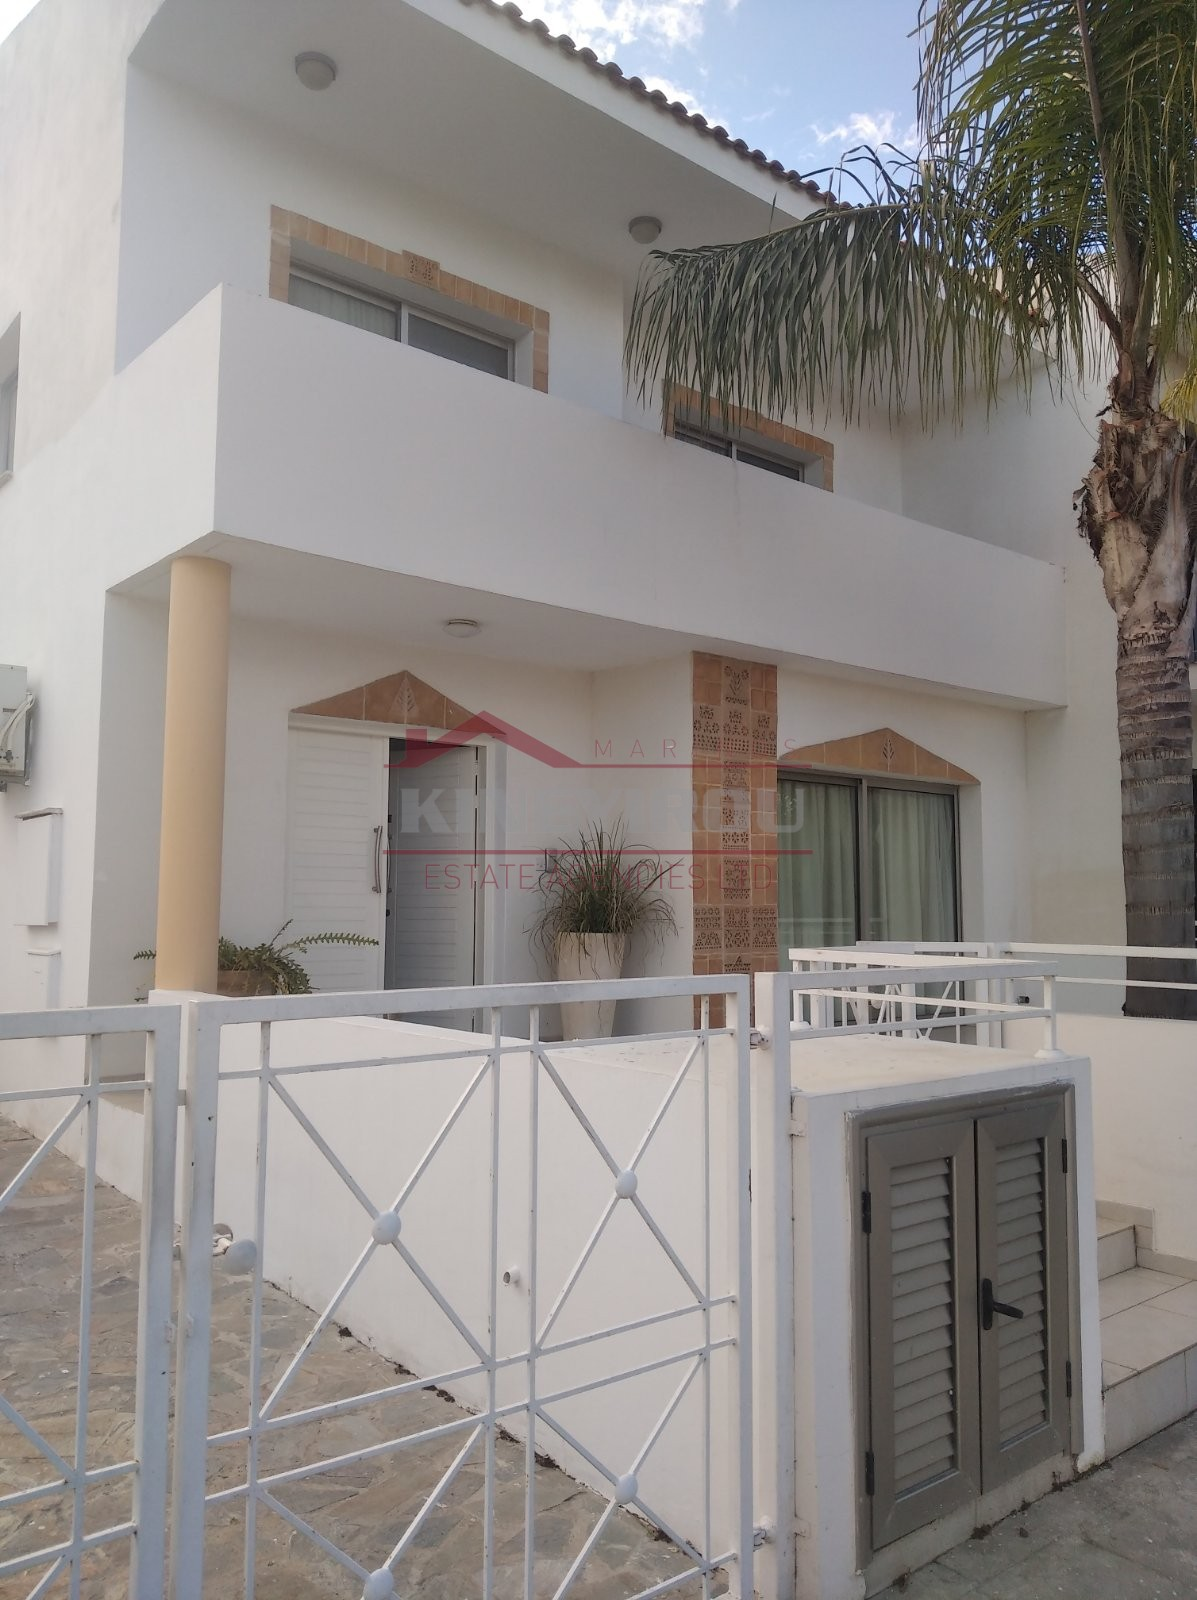 3 Bedroom House In Meneou,Larnaca